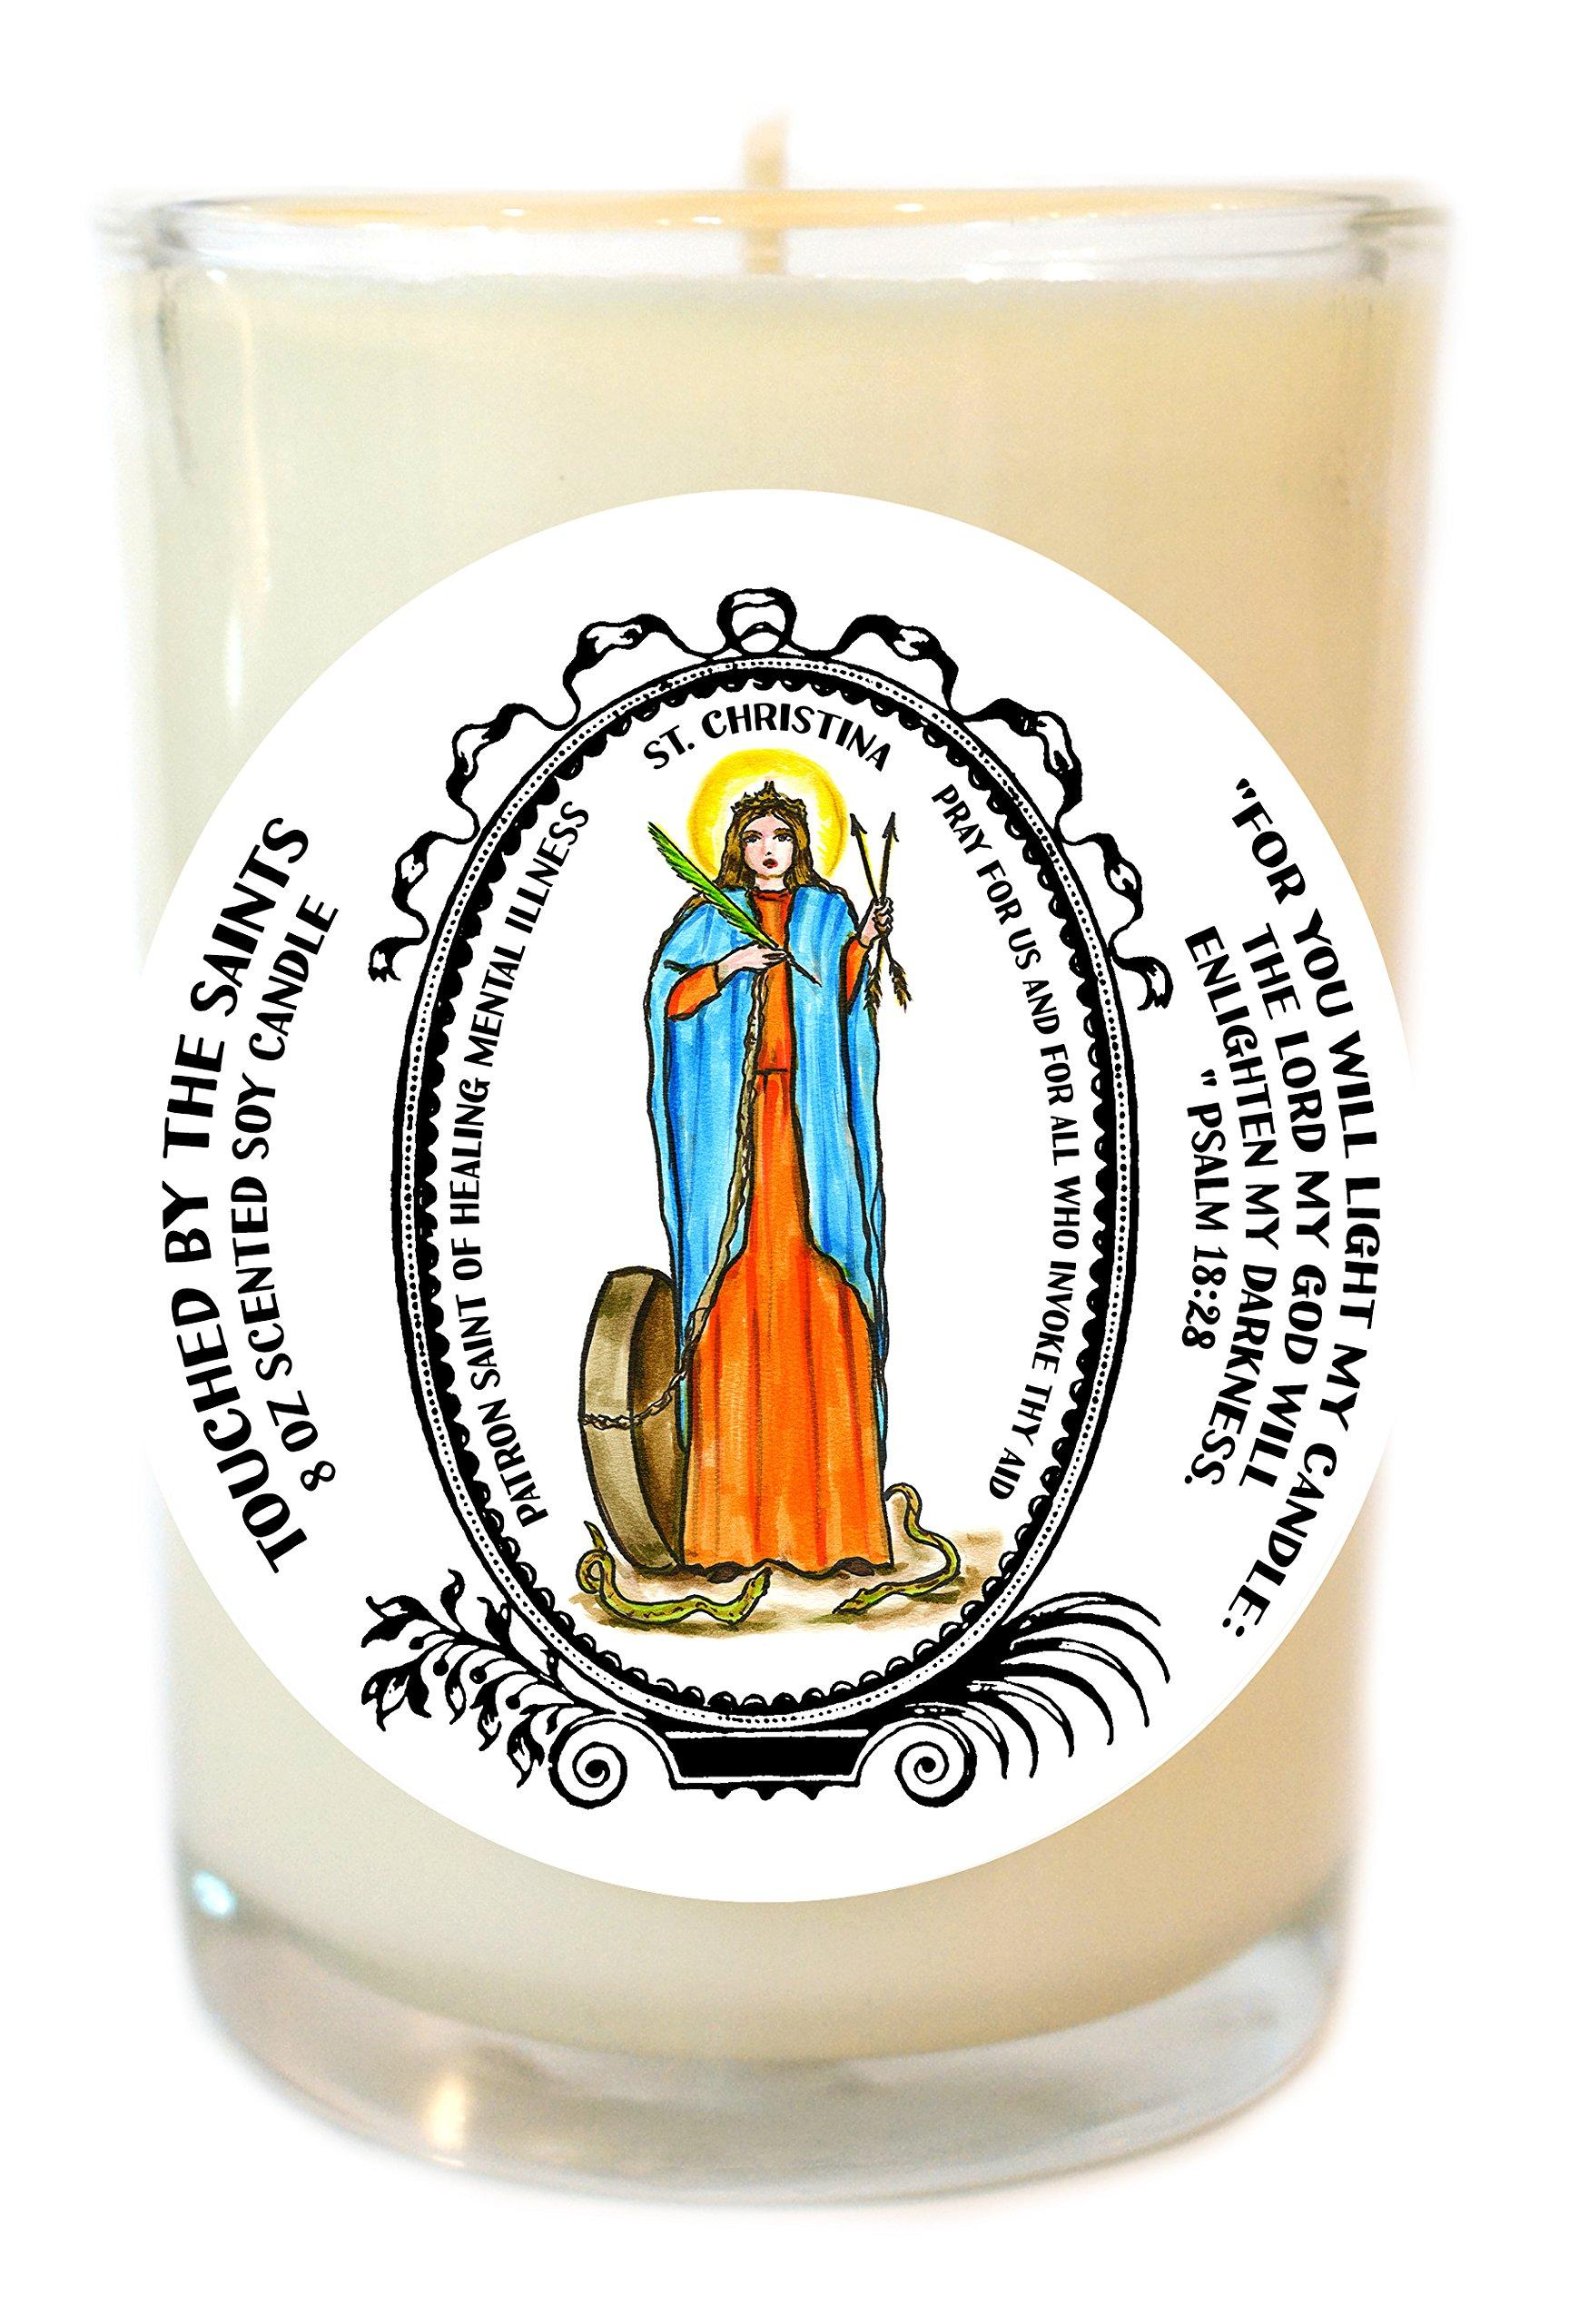 Saint Christina Patron of Healing Mental Illness 8 Oz Scented Soy Prayer Candle